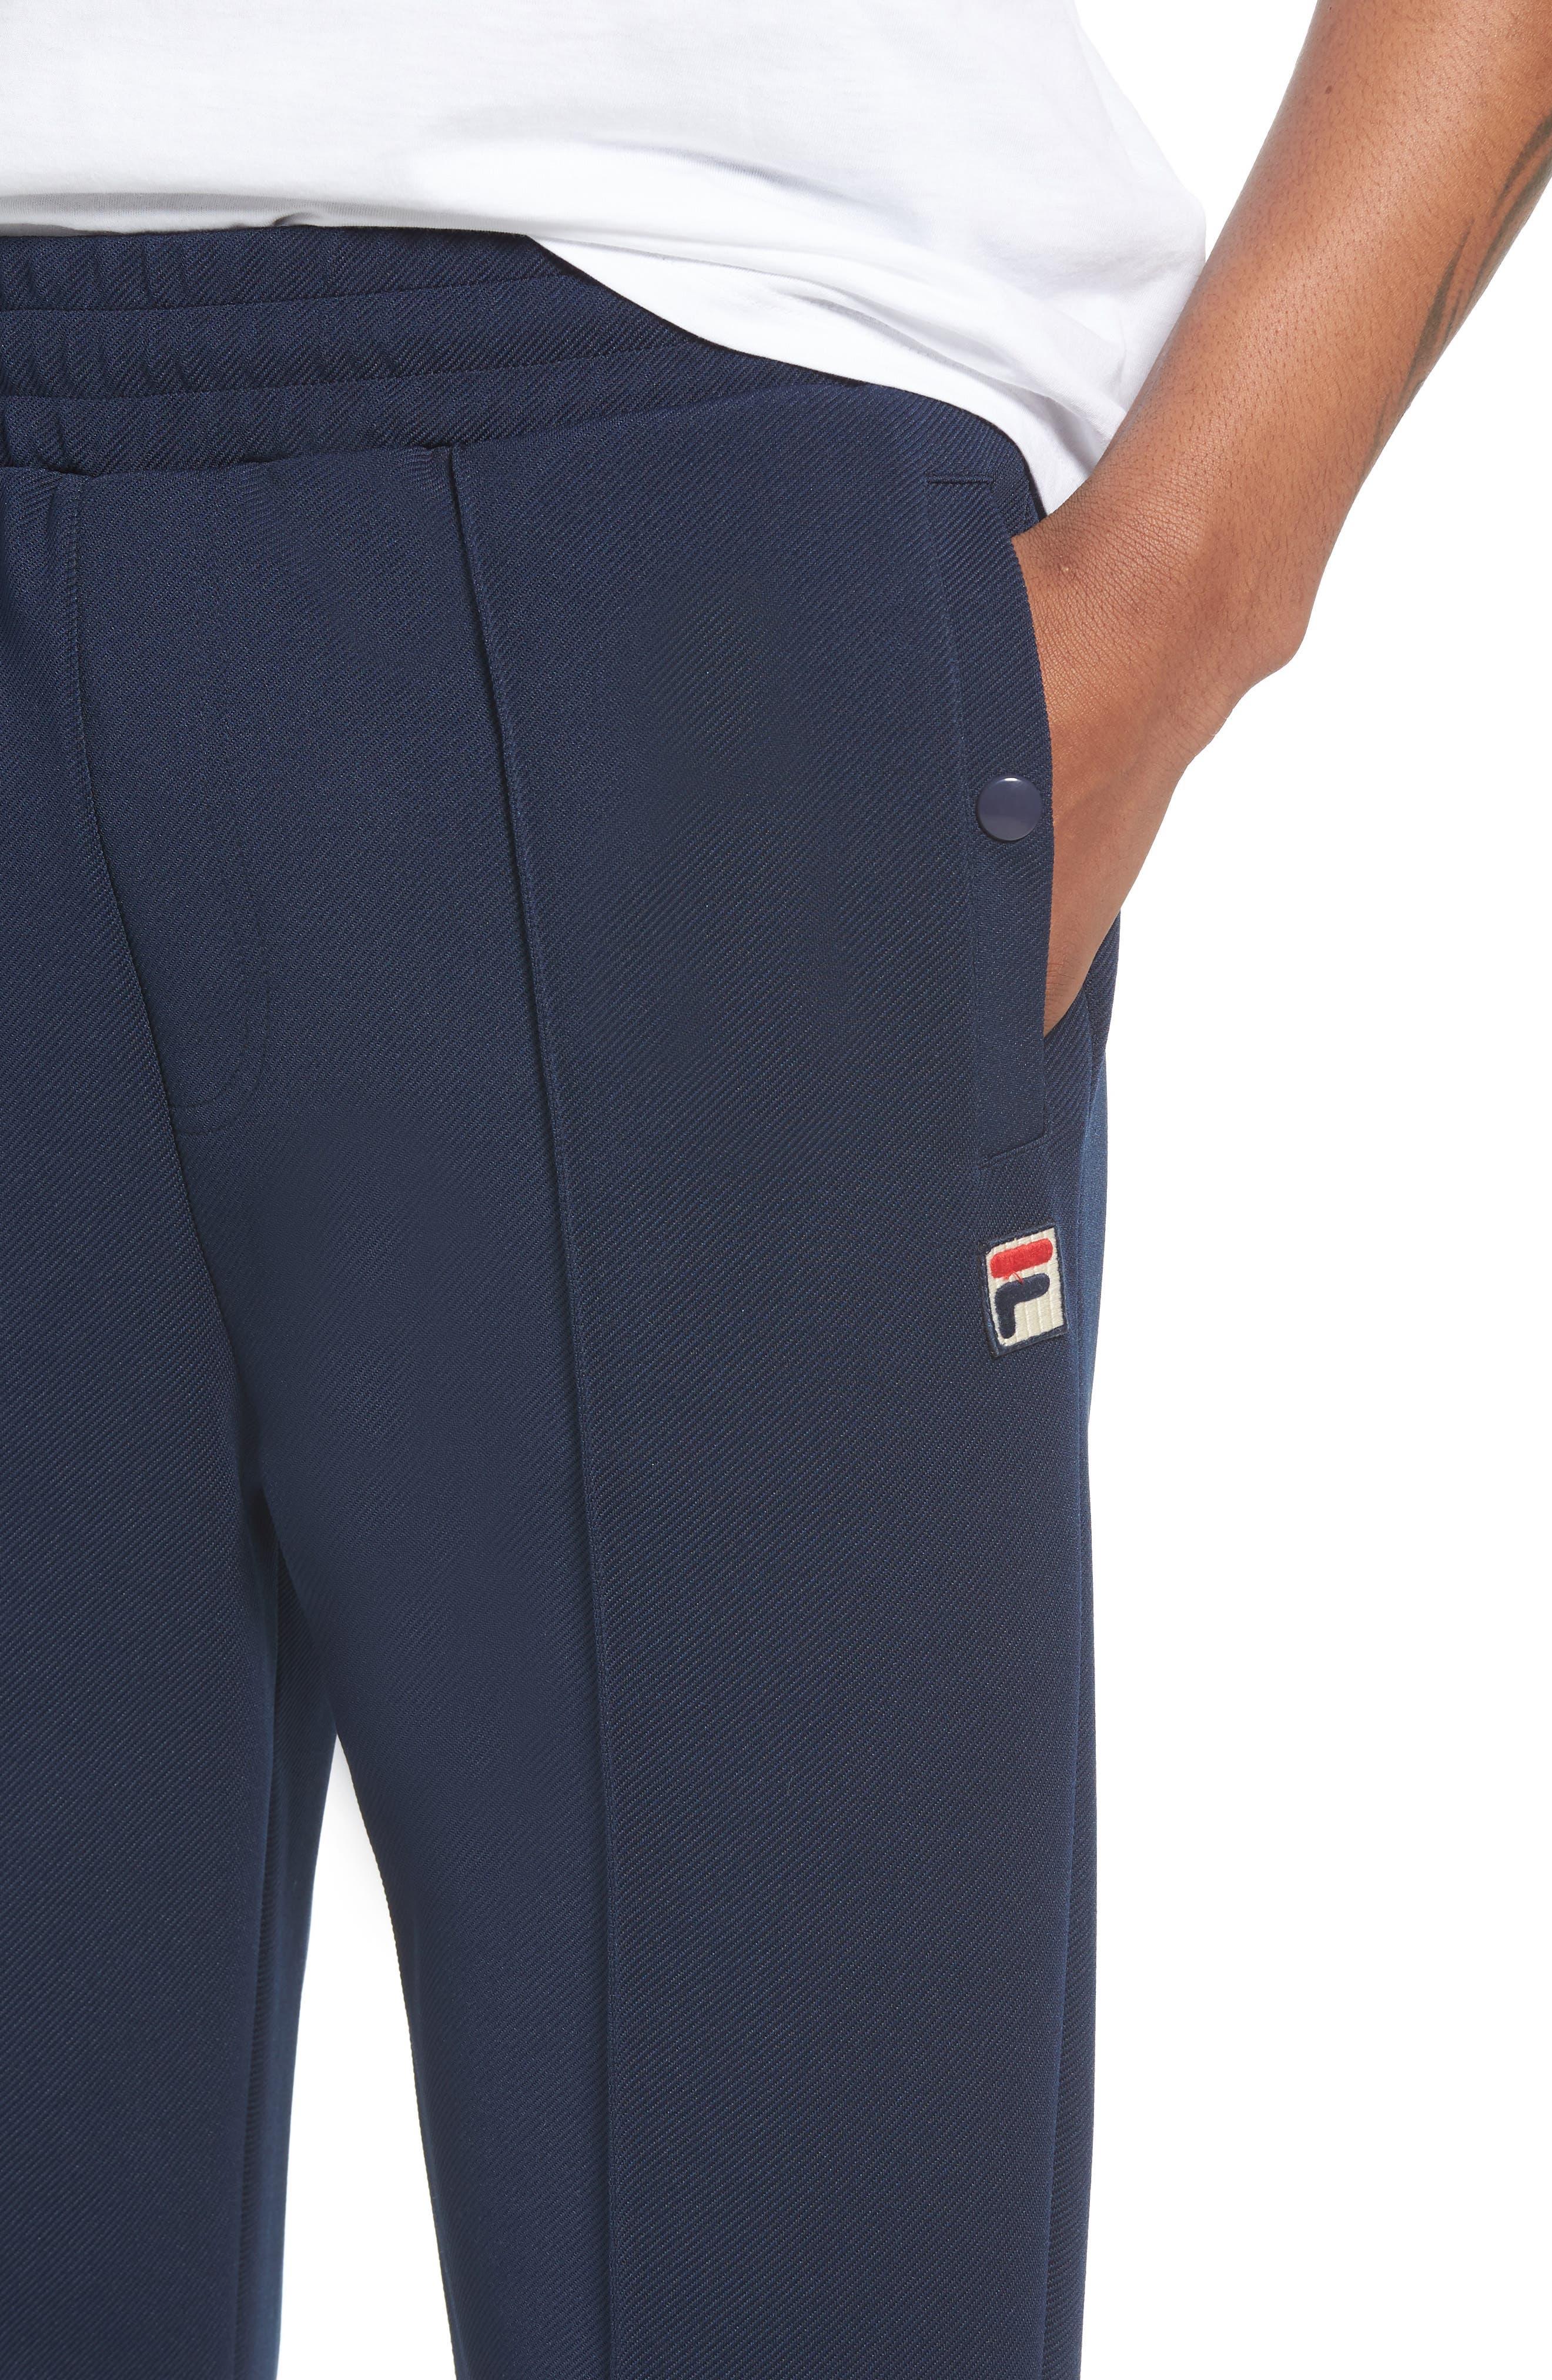 Molveno 2 Pants,                             Alternate thumbnail 8, color,